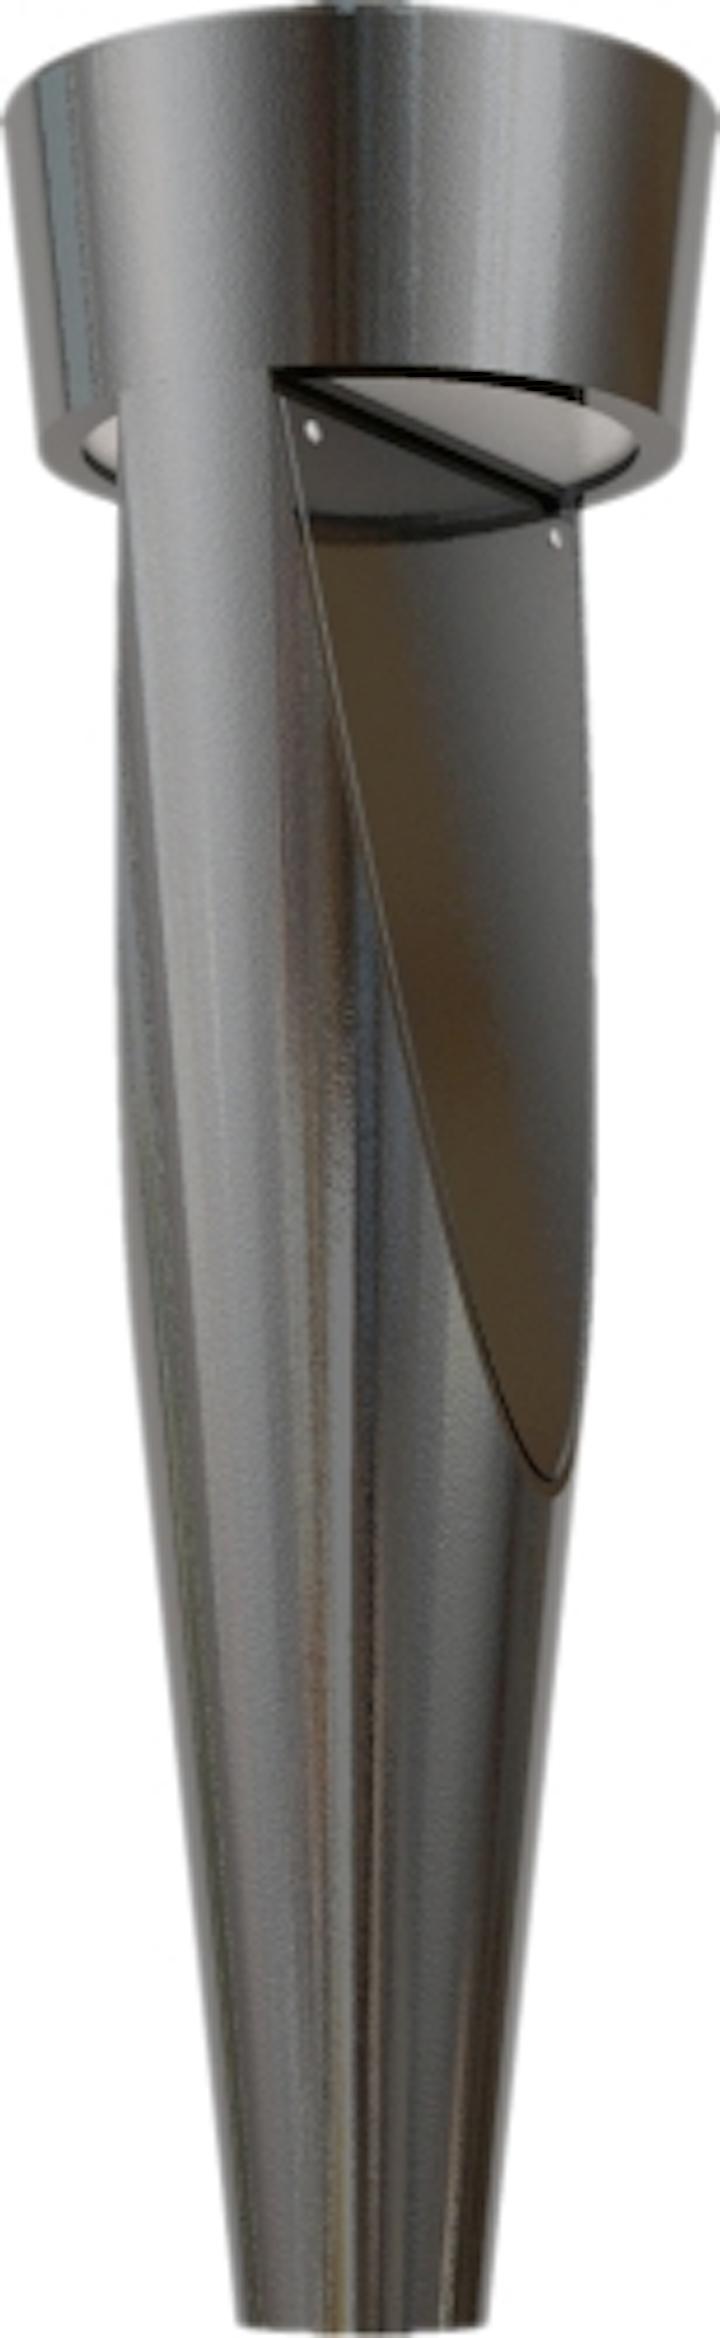 U.S. Architectural Lighting introduces Tornado bollard with optional LED light source